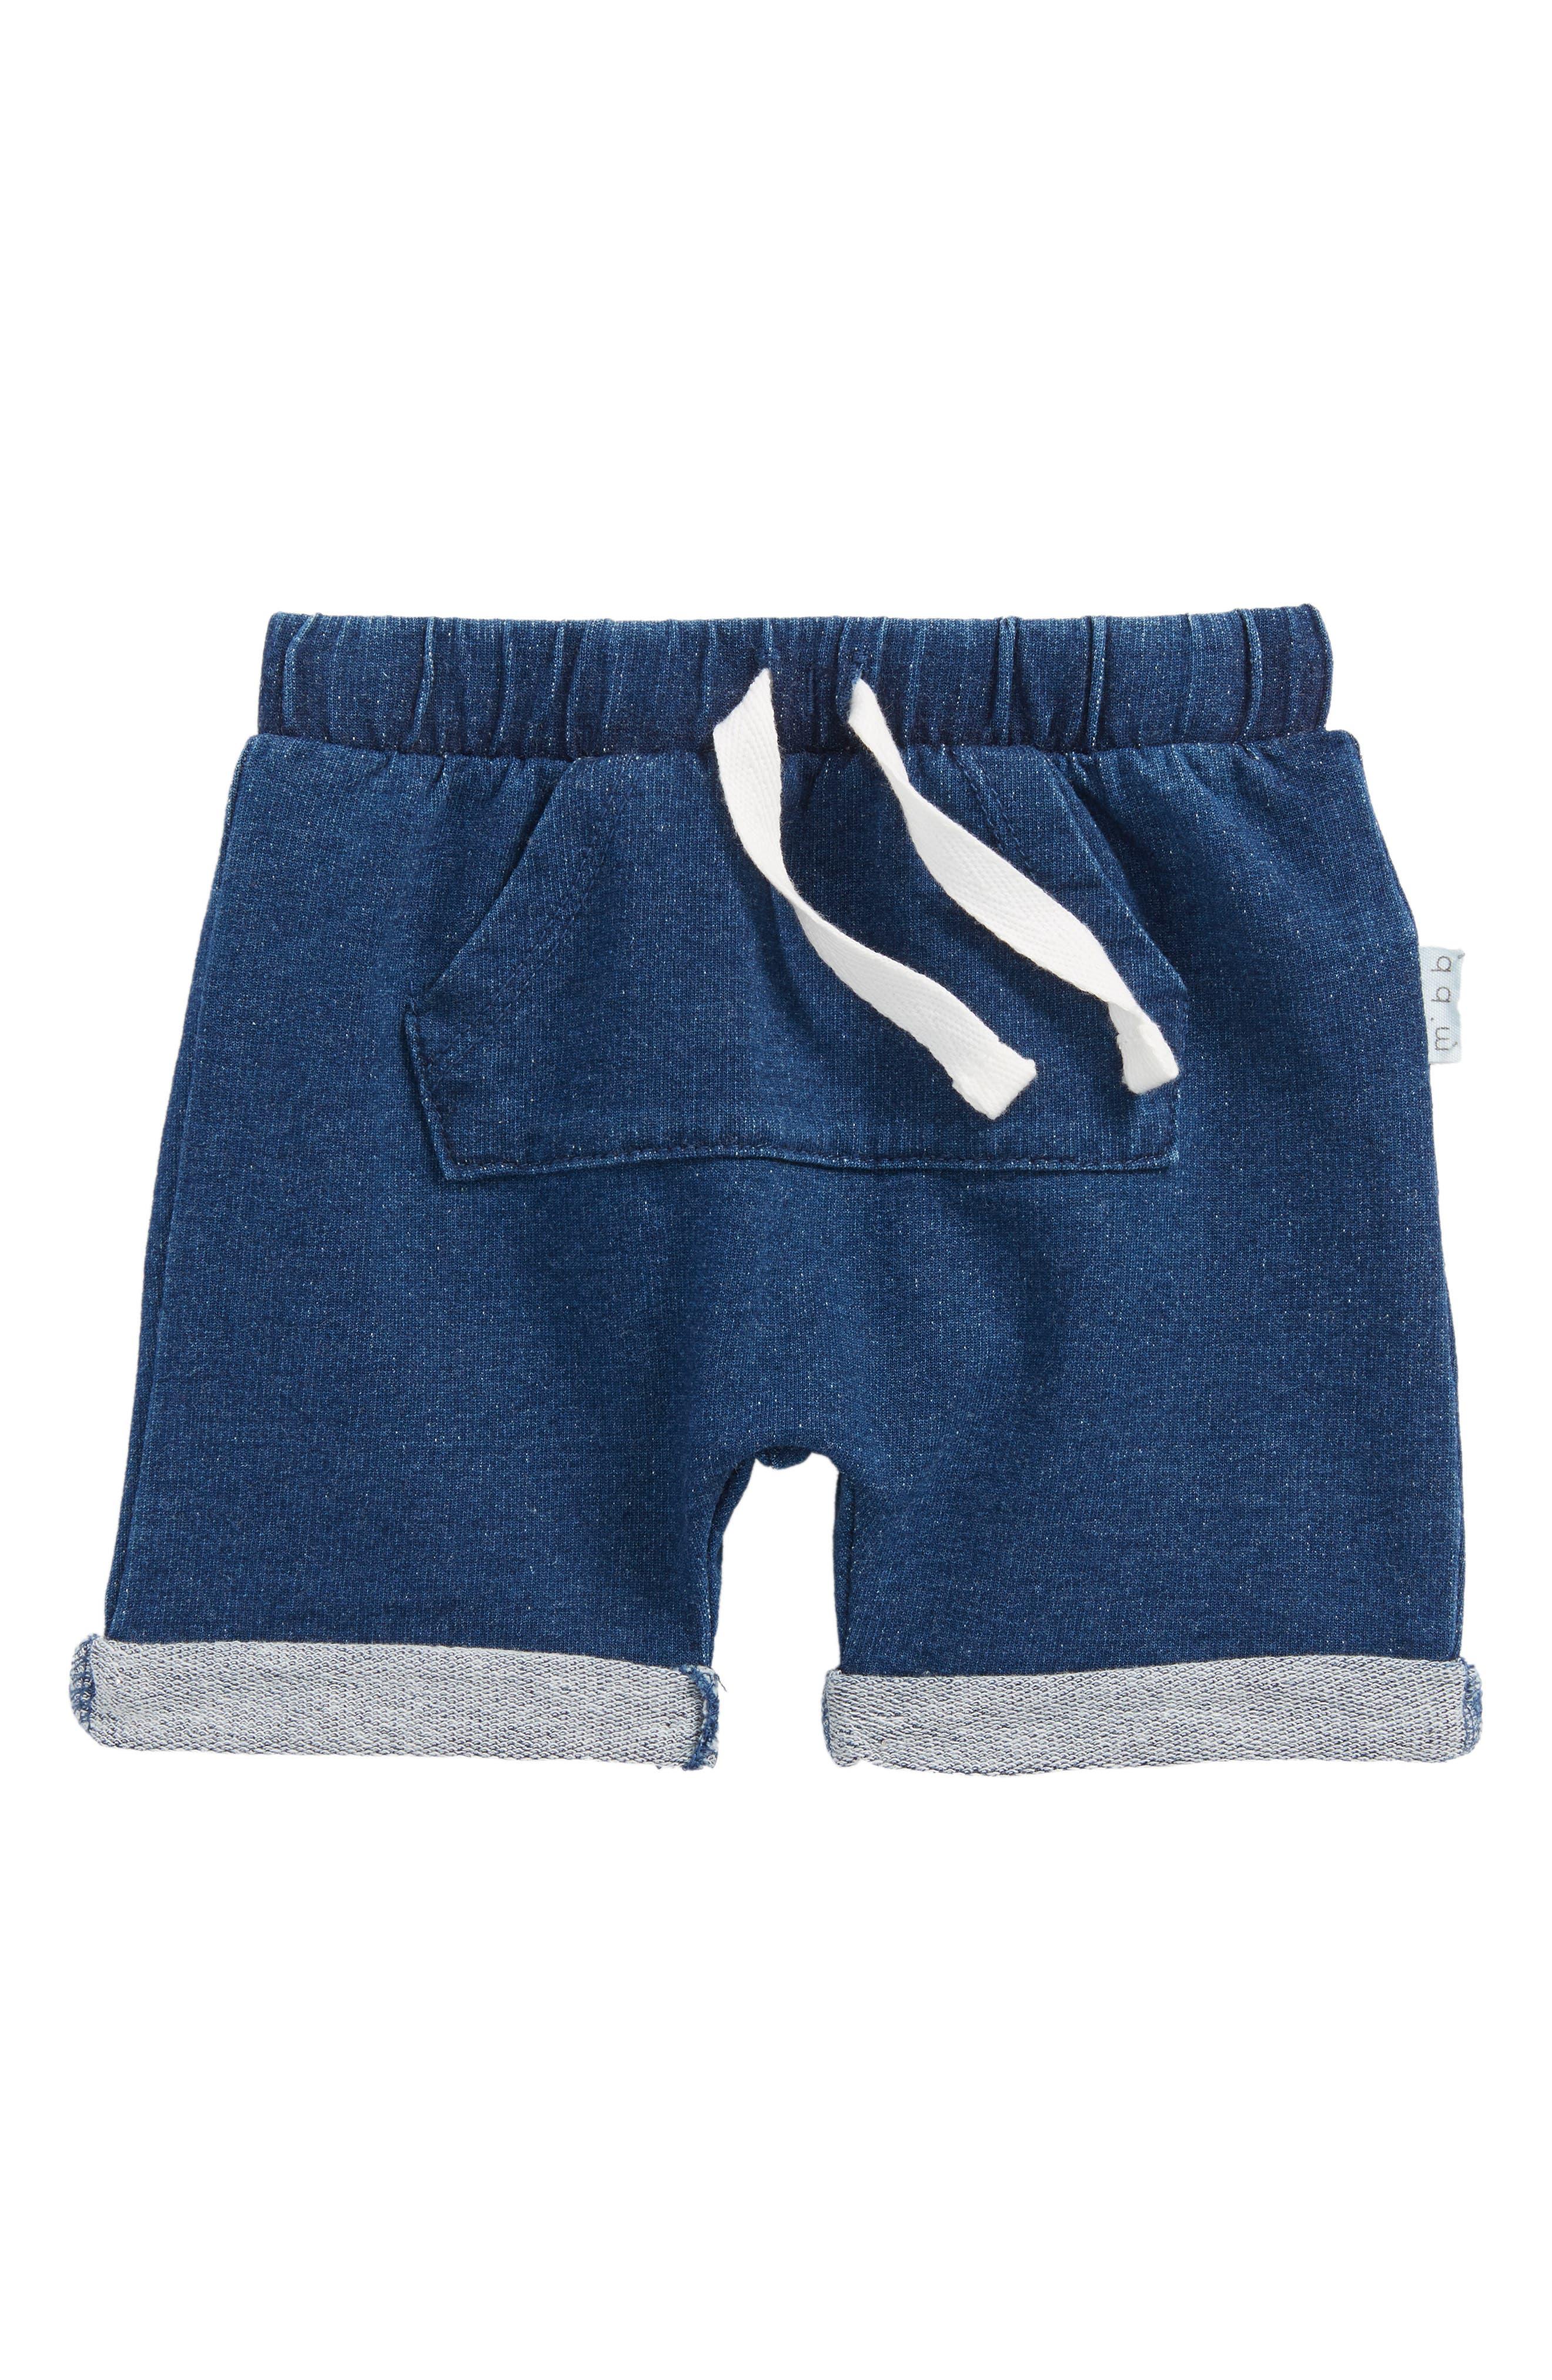 Denim Look Shorts,                             Main thumbnail 1, color,                             400